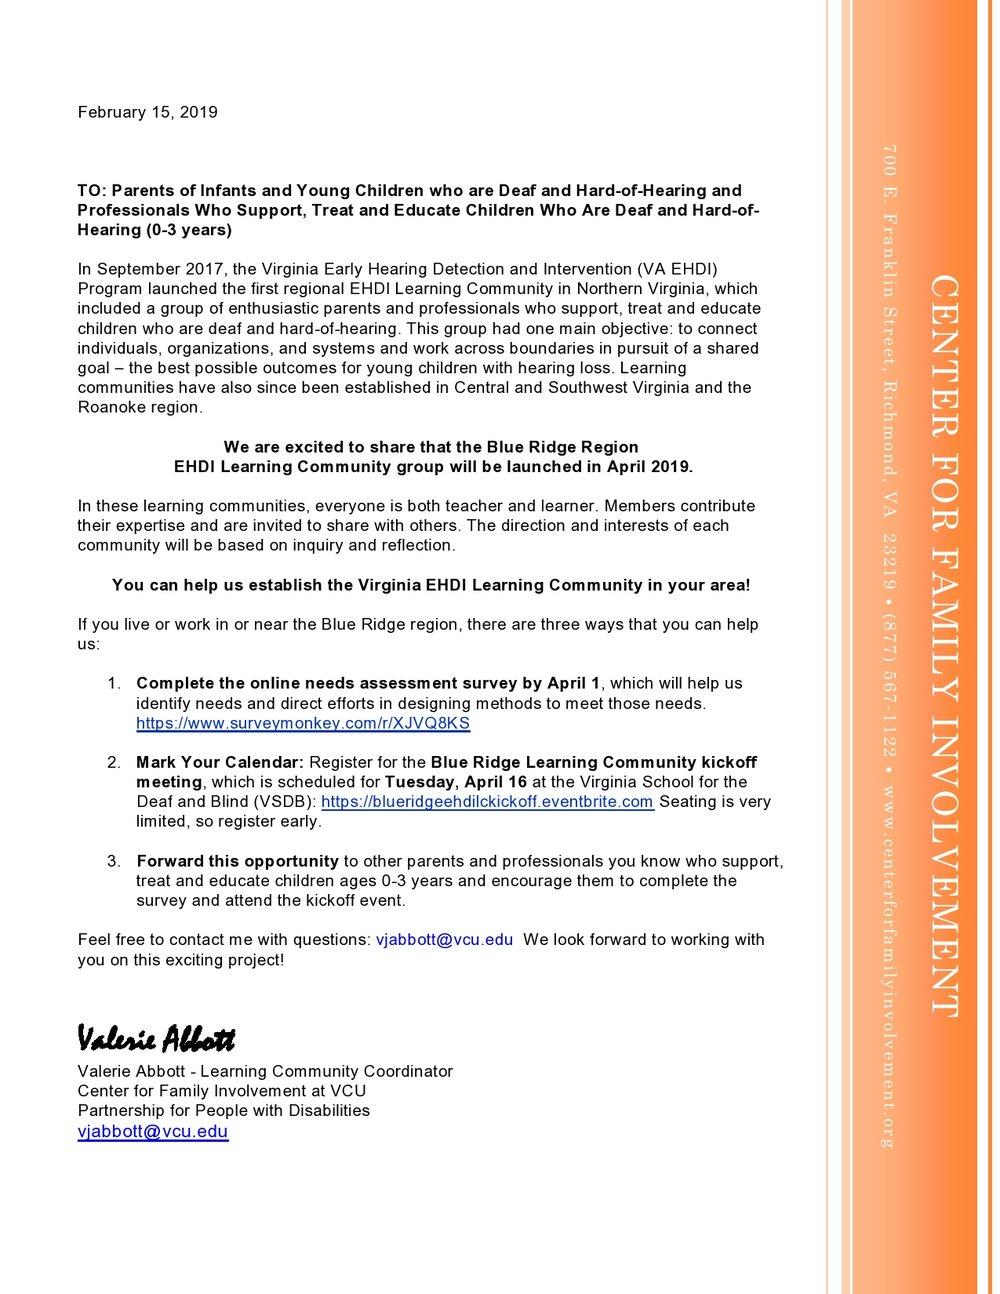 BRLC Parent and Prof Letter 2.14.19.jpg